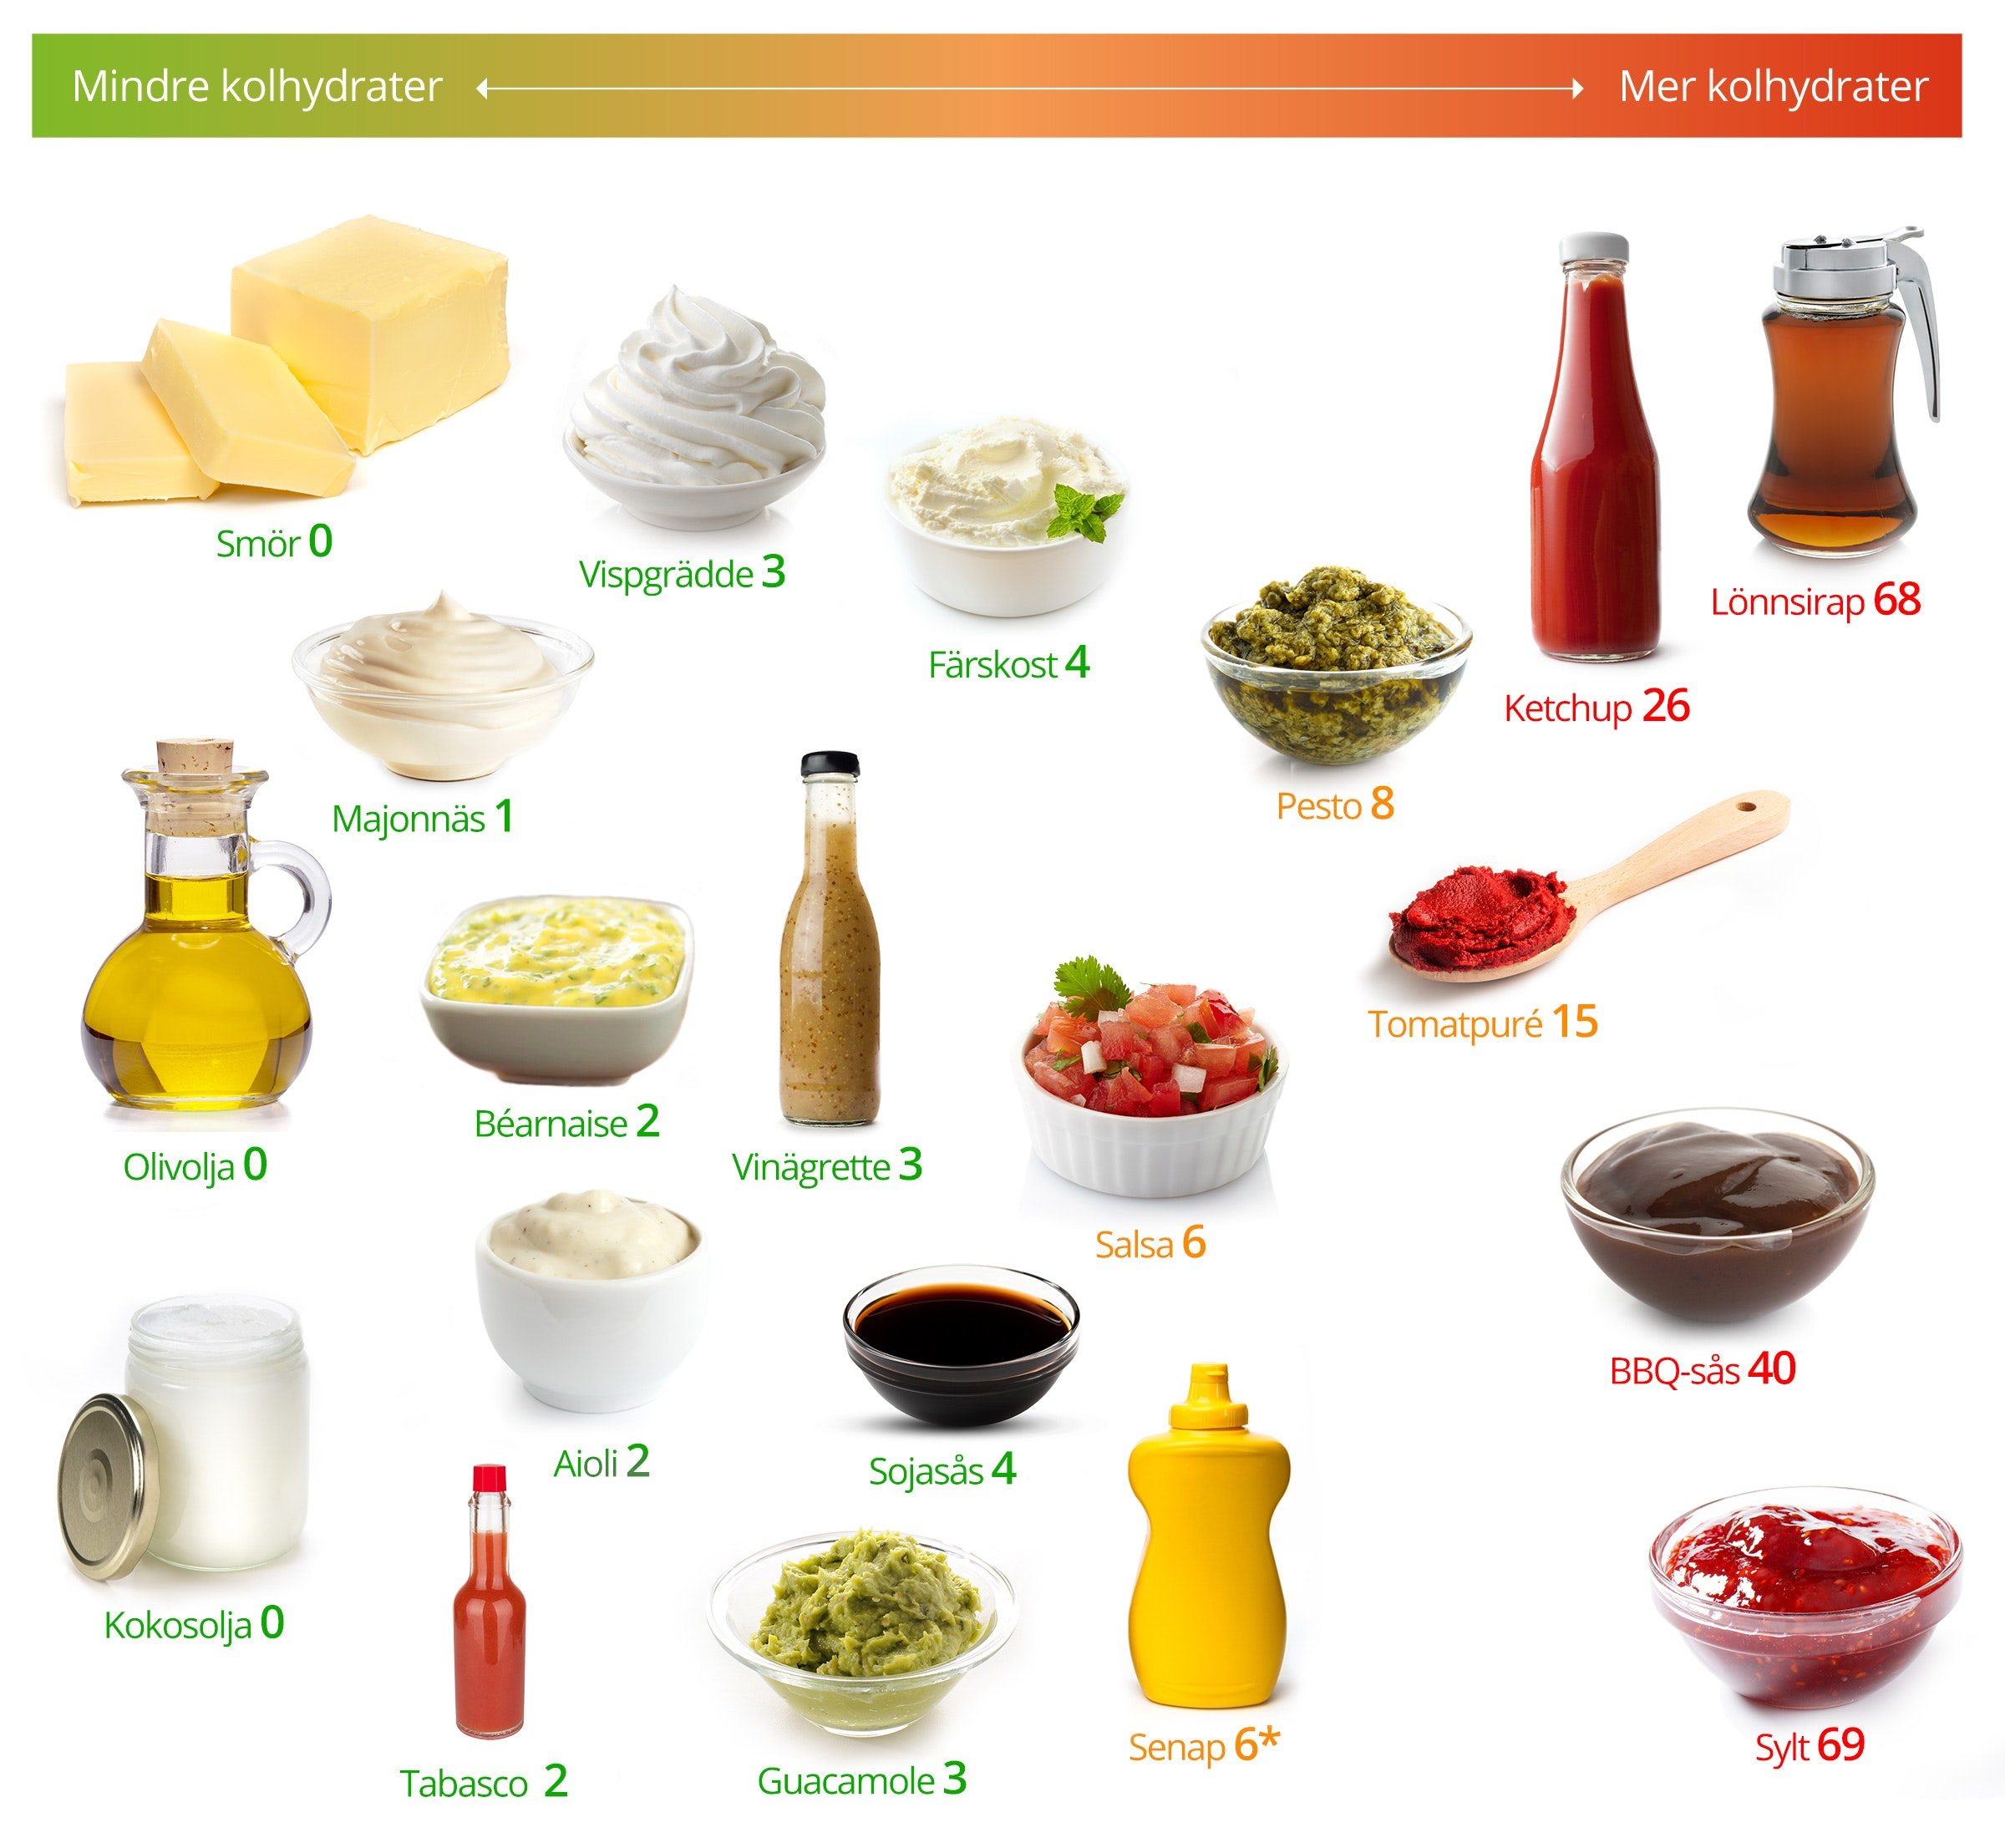 lchf lista kolhydrater